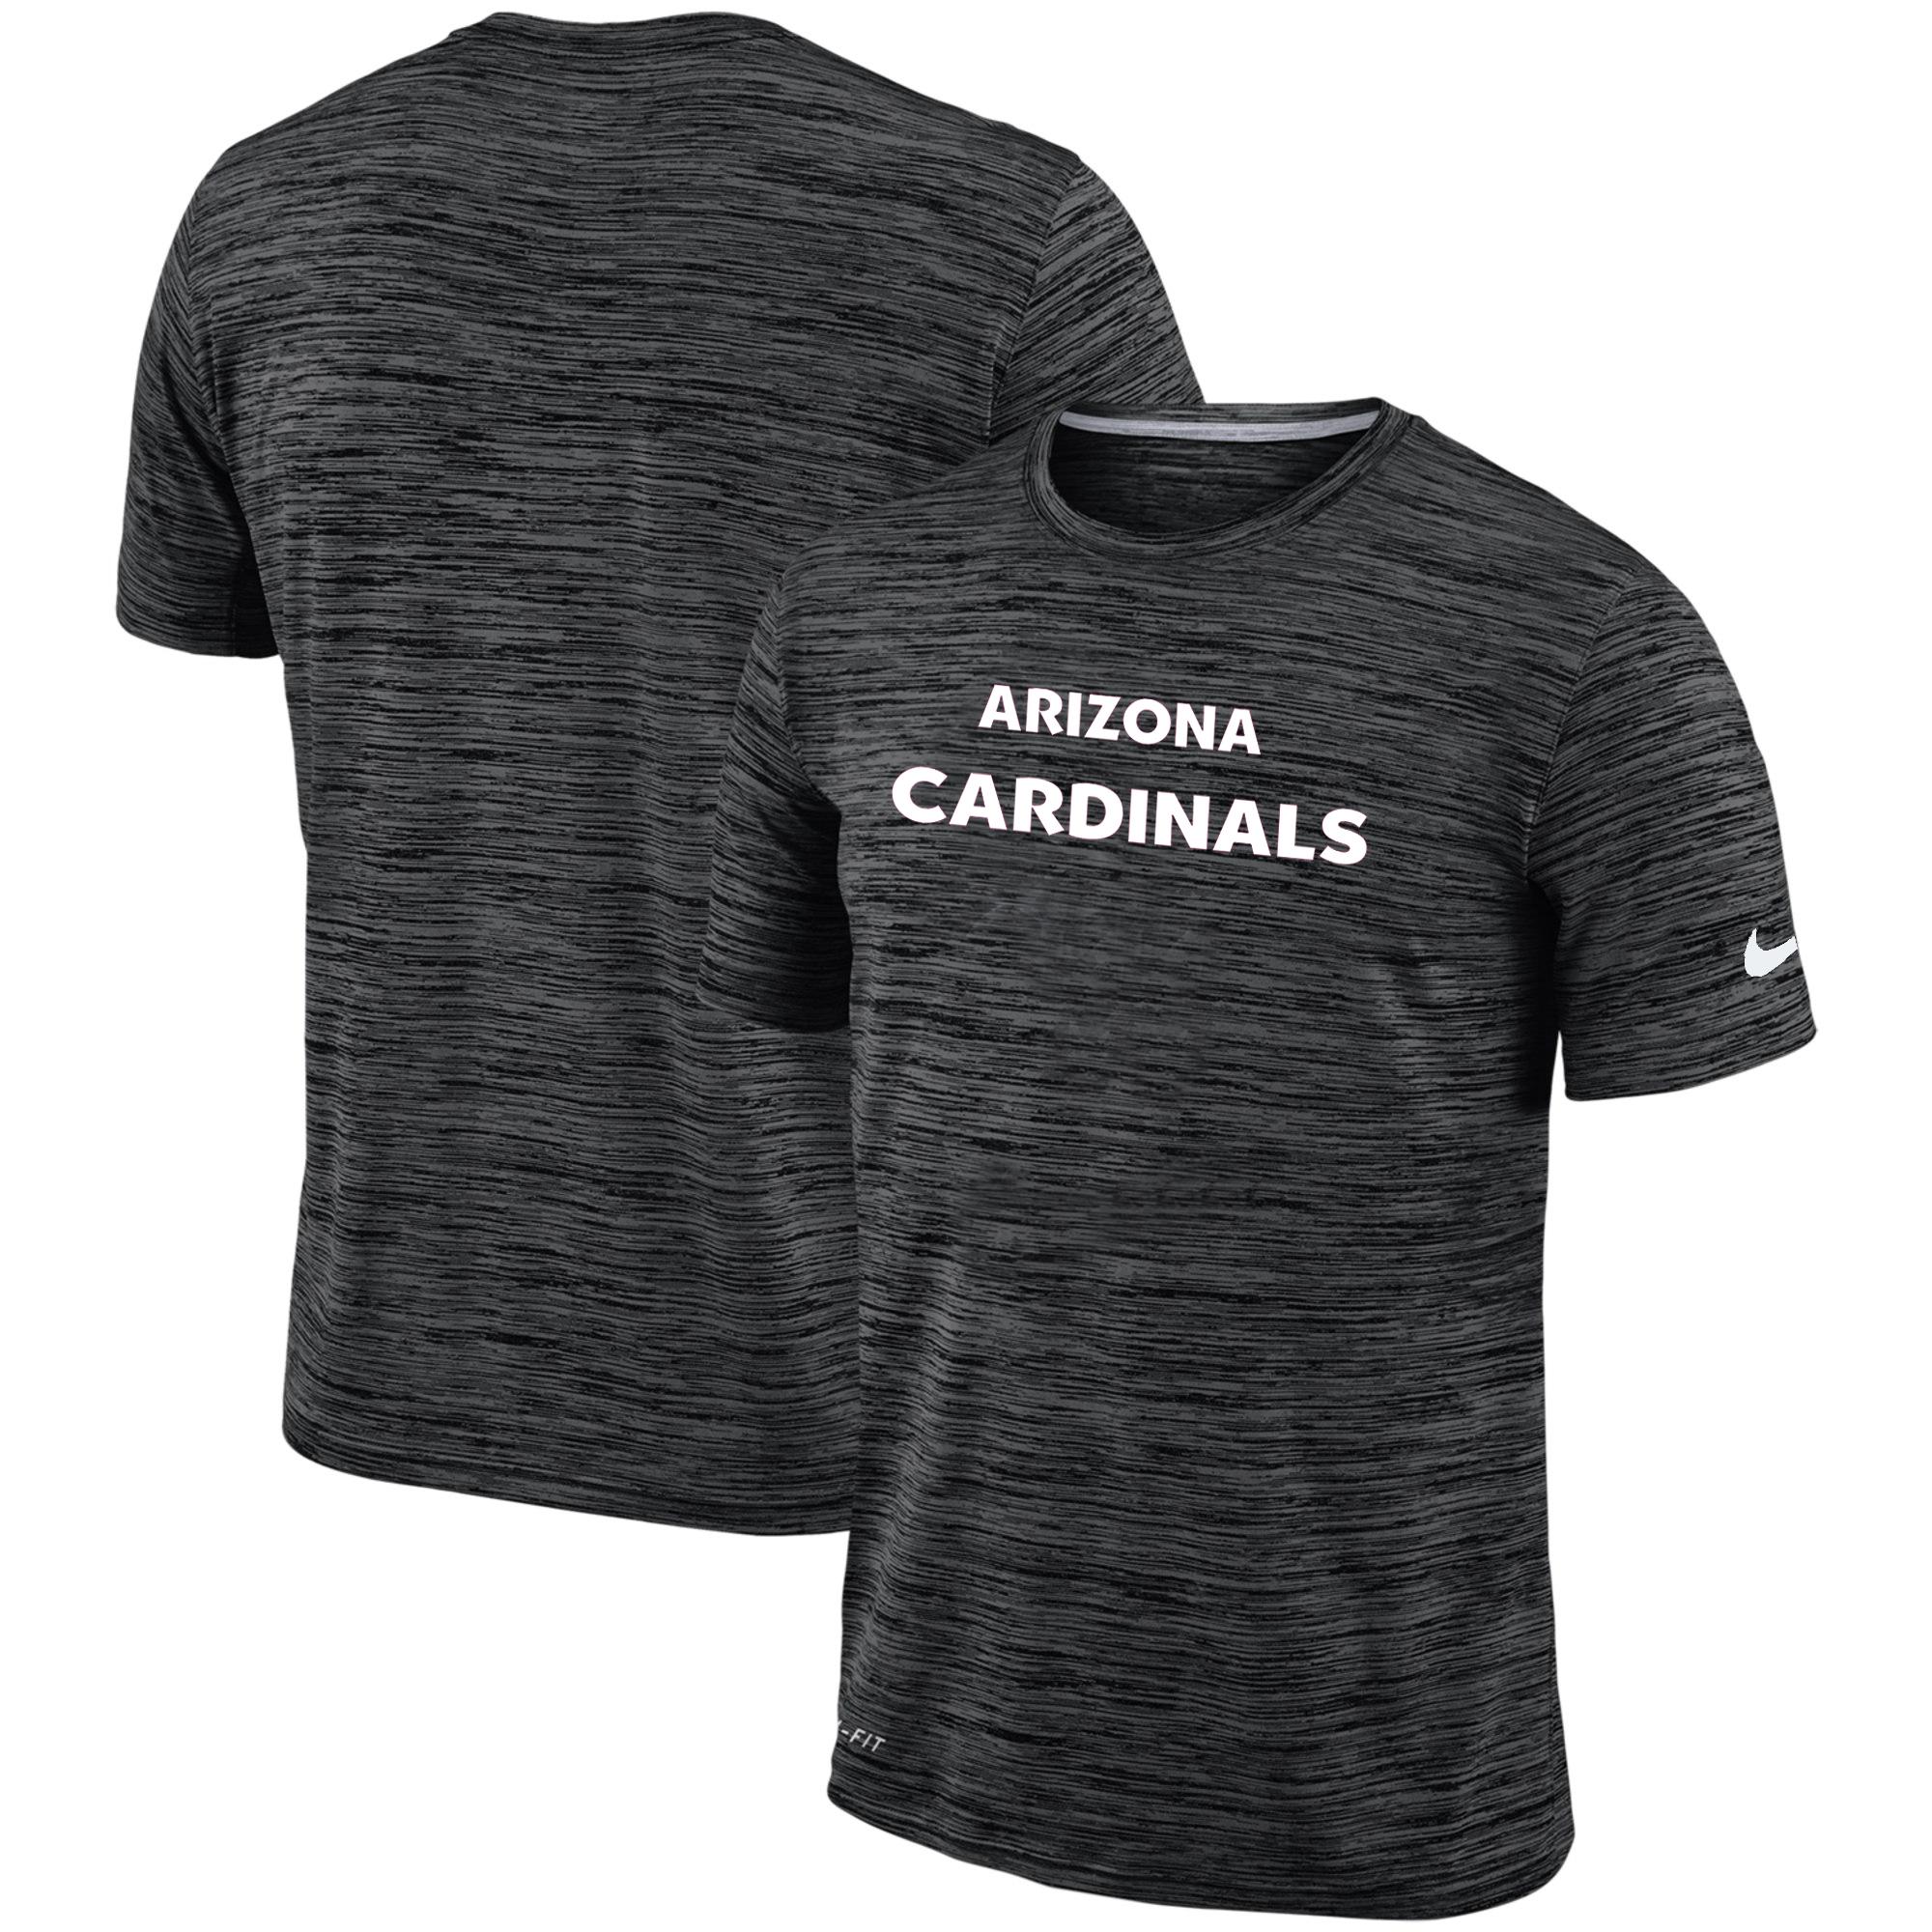 Men's Arizona Cardinals Nike Black Velocity Performance T-Shirt